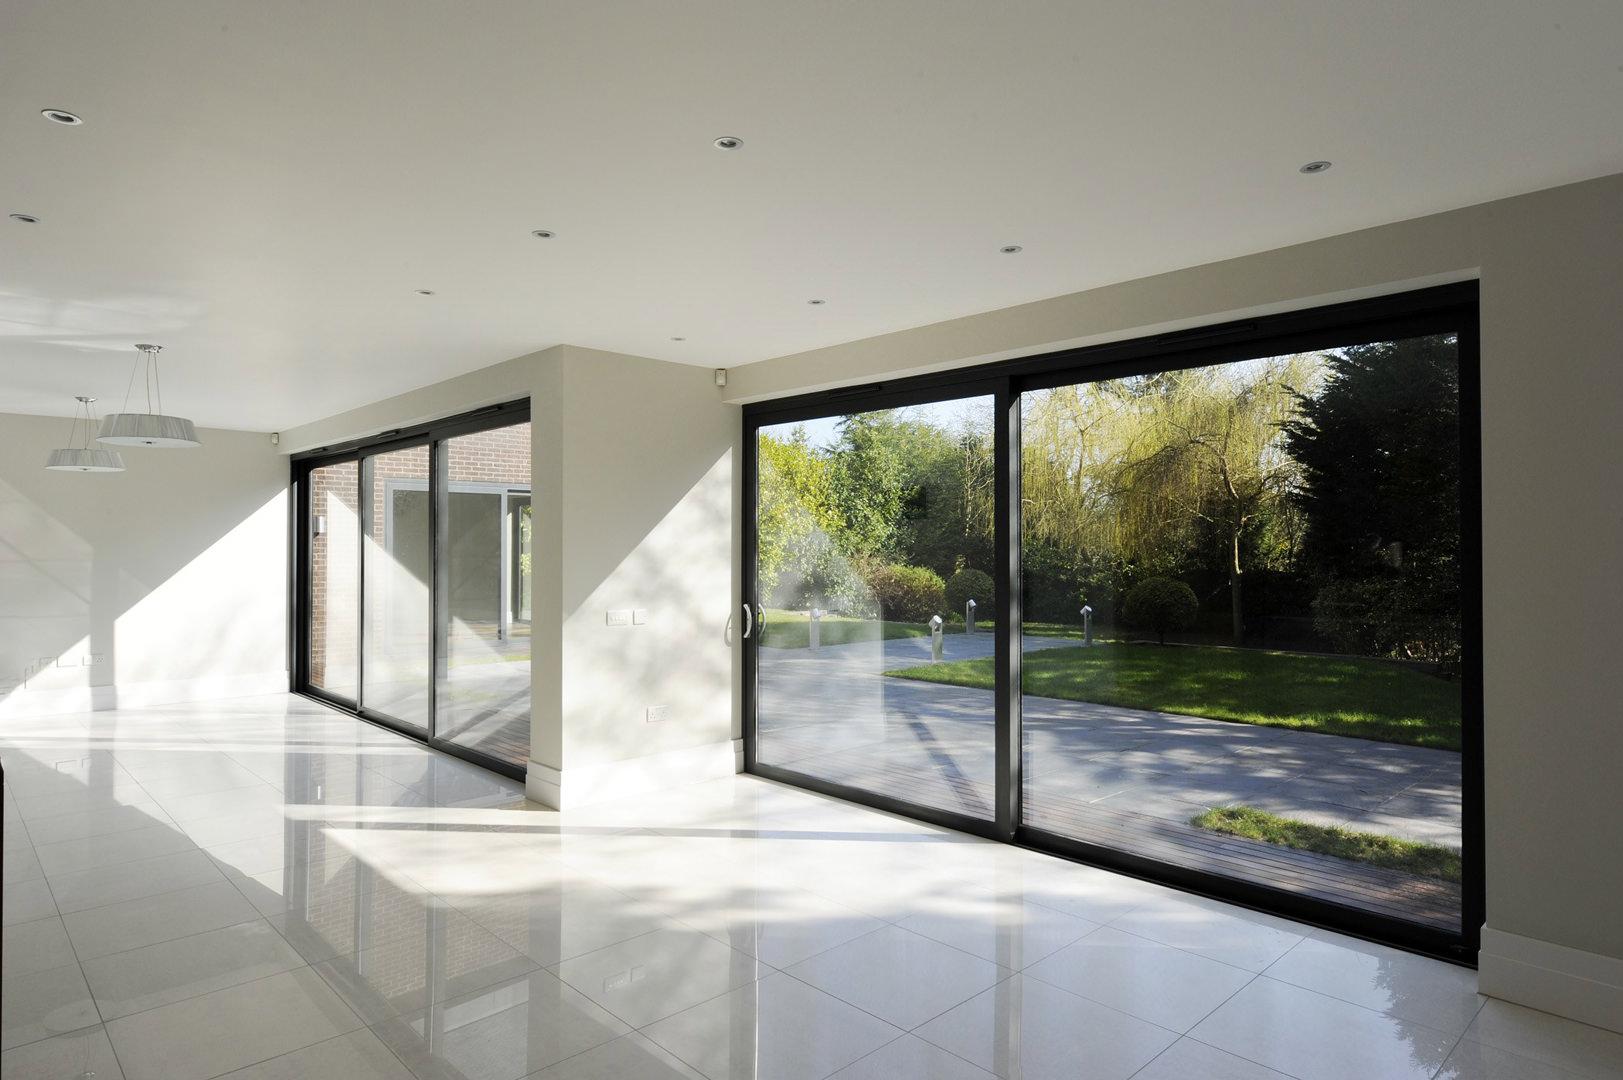 East Ridgeway House - 1270S_PI011